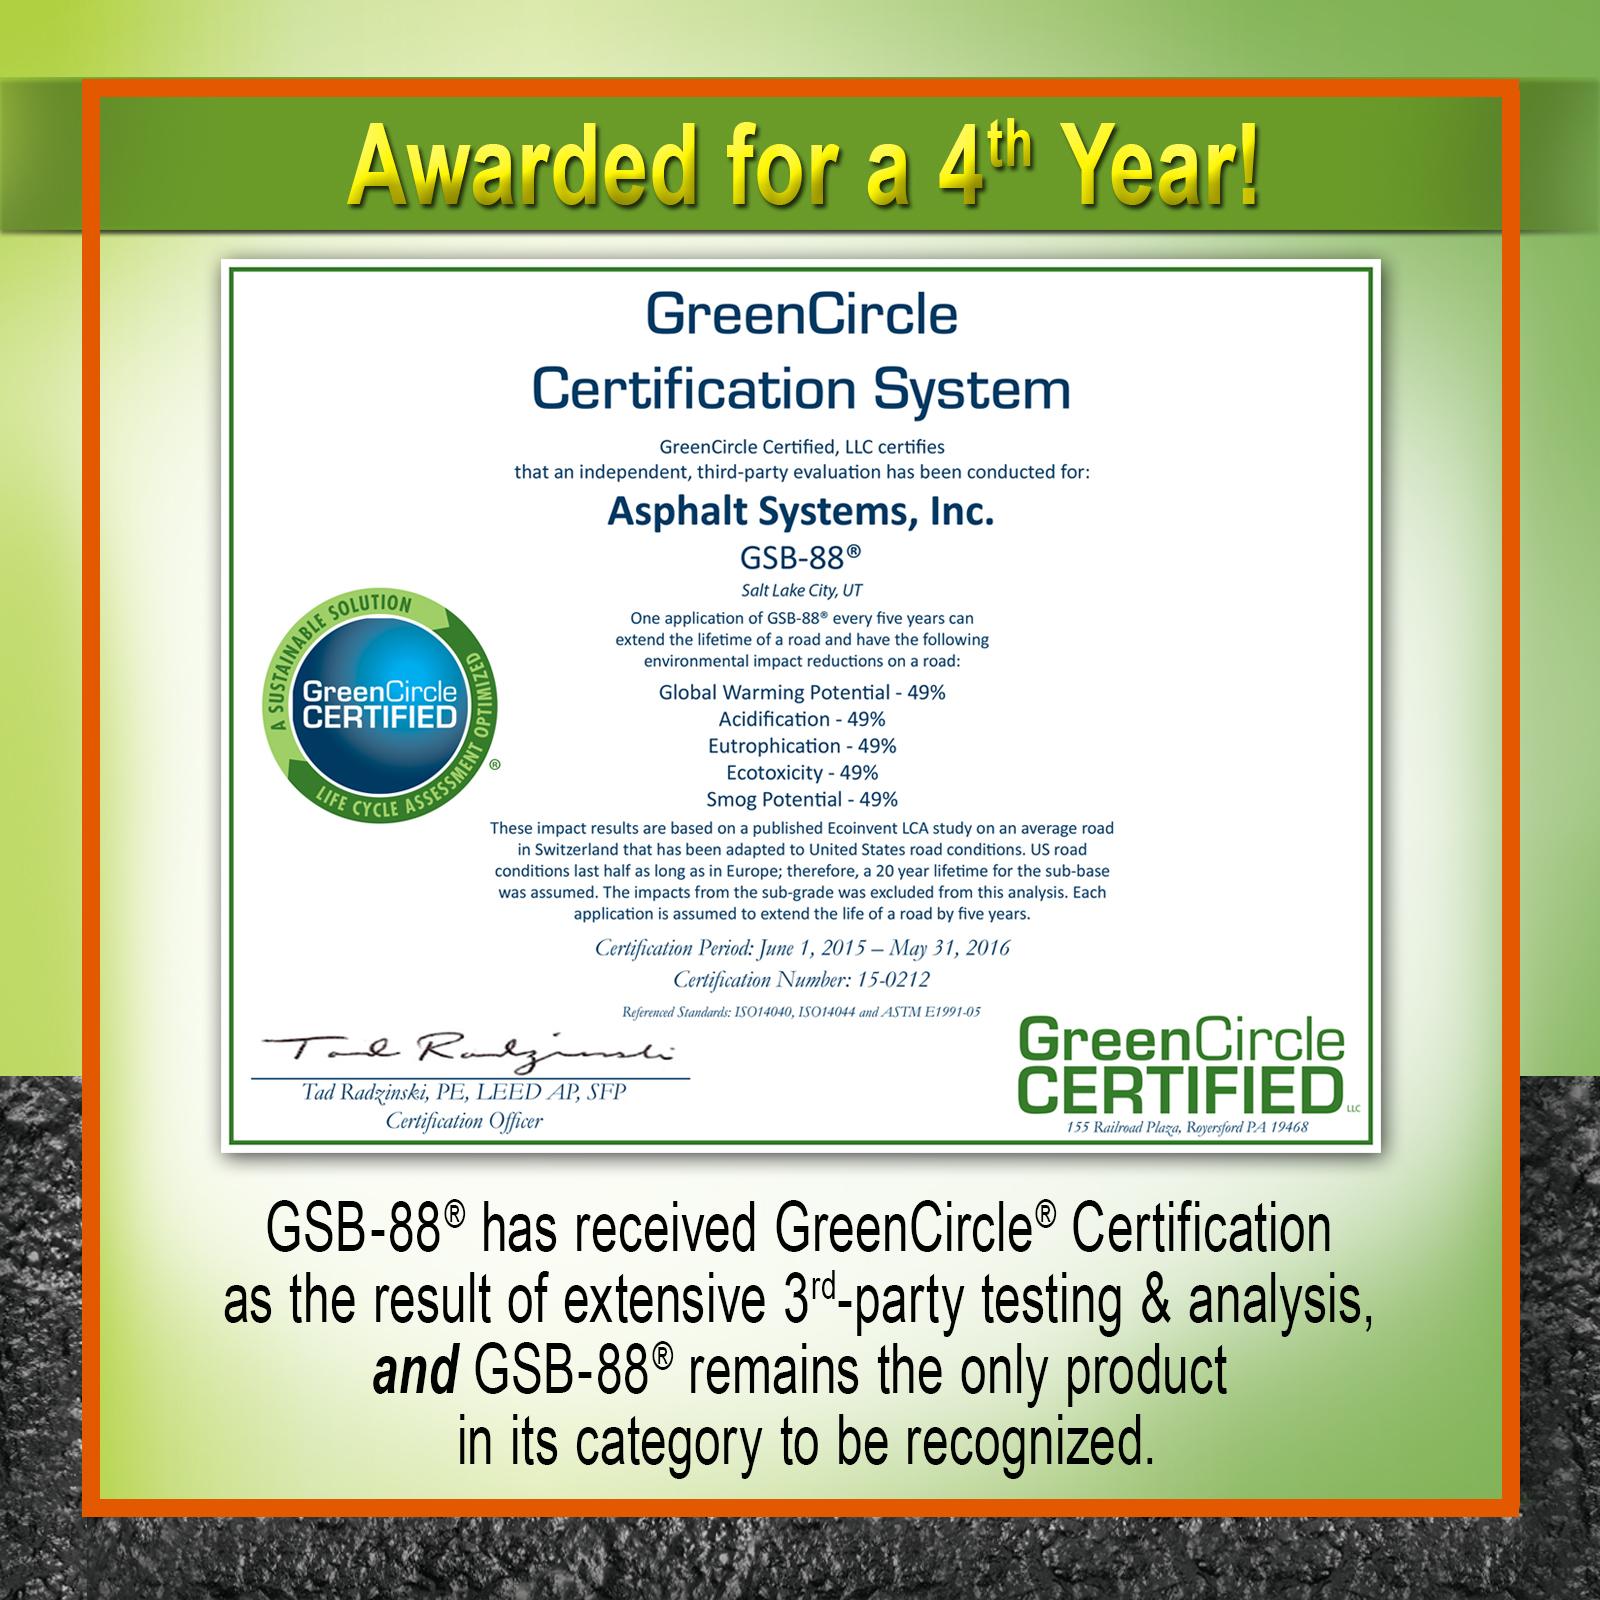 Gee Asphalt Systems Inc Gsb 88 Received 4th Greencircle